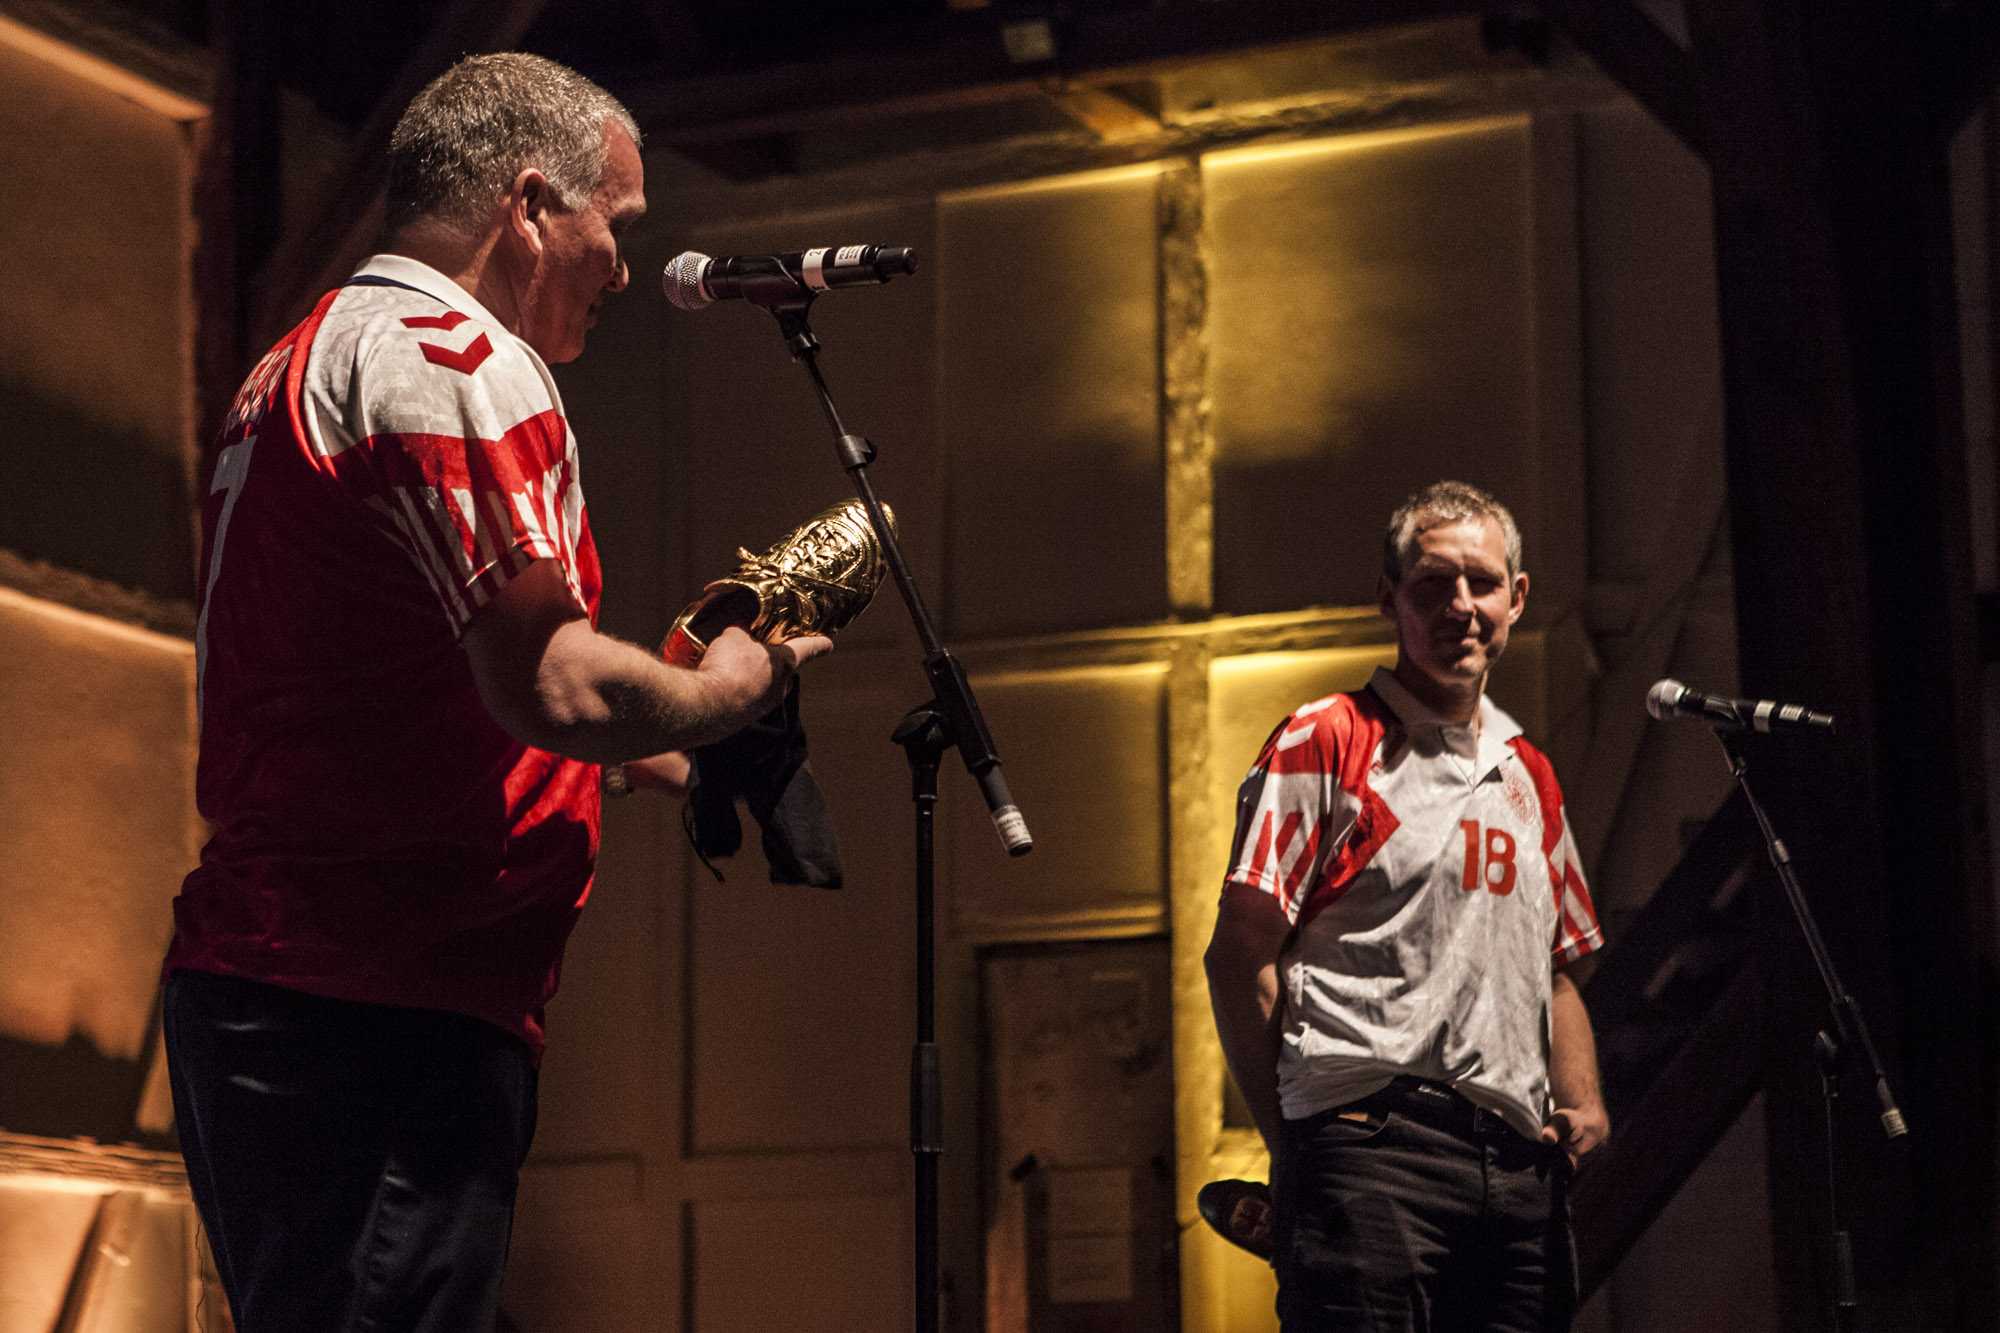 John Faxe og Kim Vilfort kom på scenen iført Hummel trøjer.